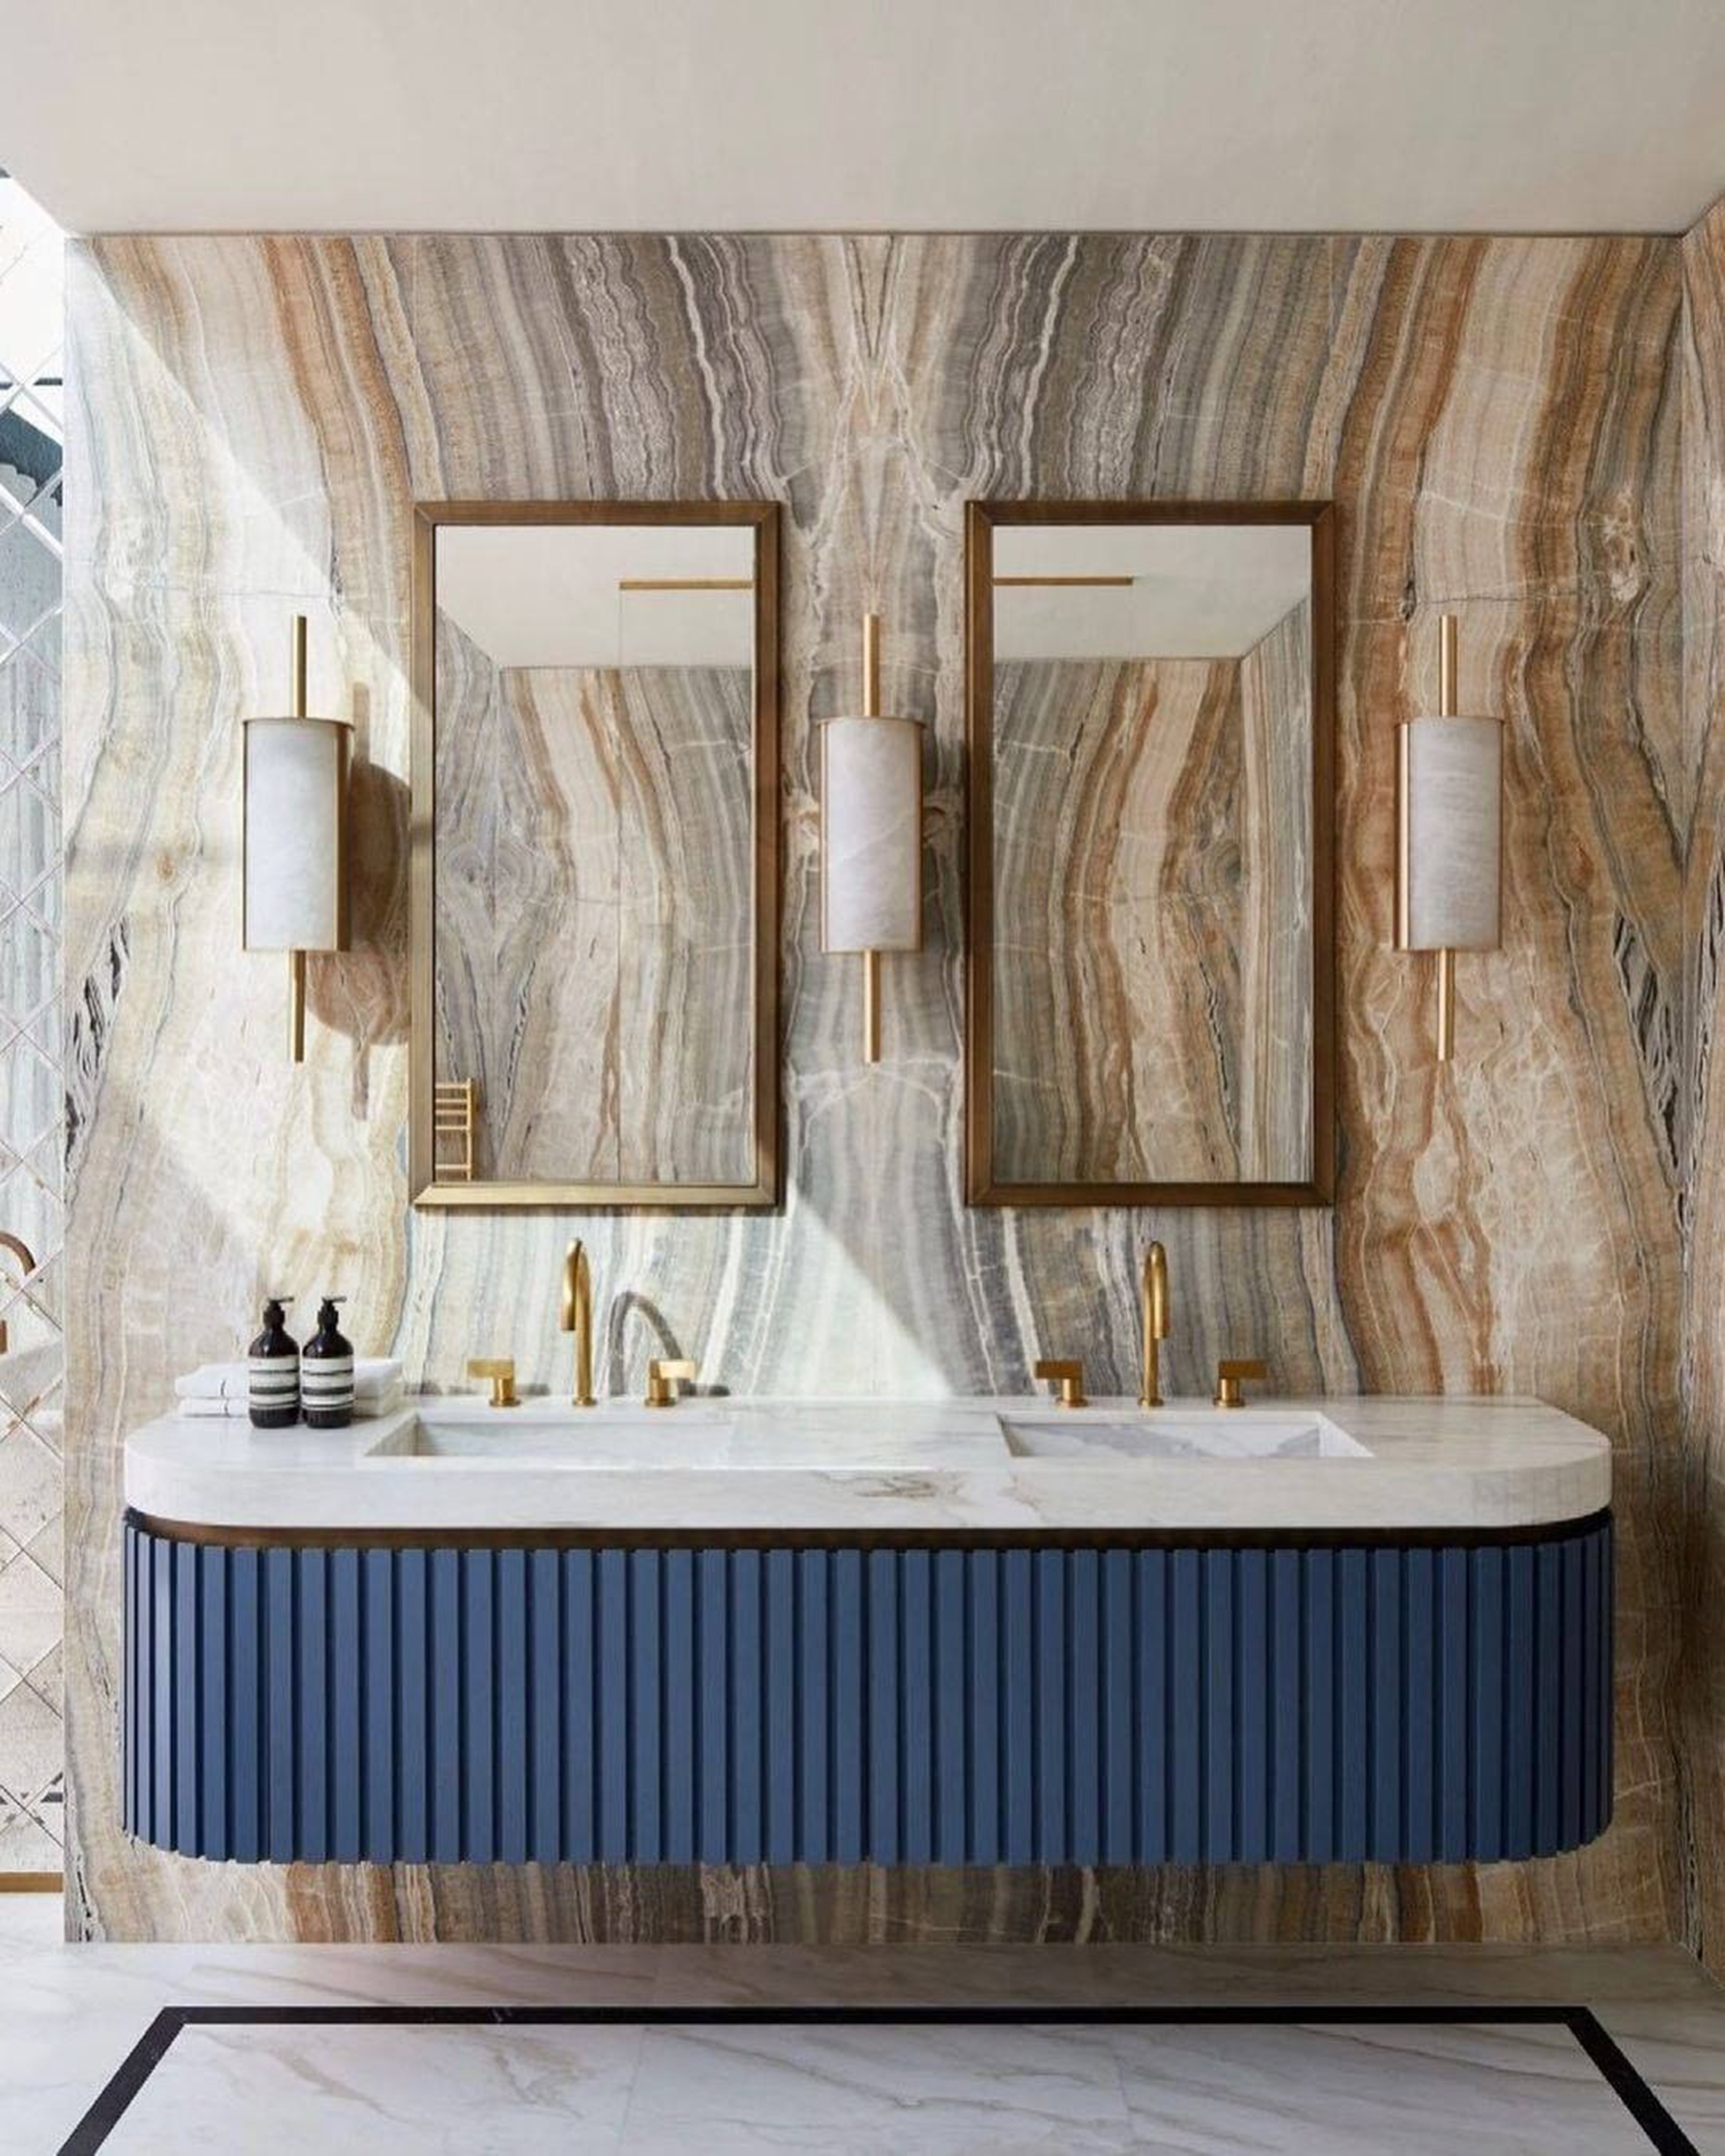 Double Sink Vanities double sink Double Sink Vanities 163605794 166670271966728 4769469429017671721 n